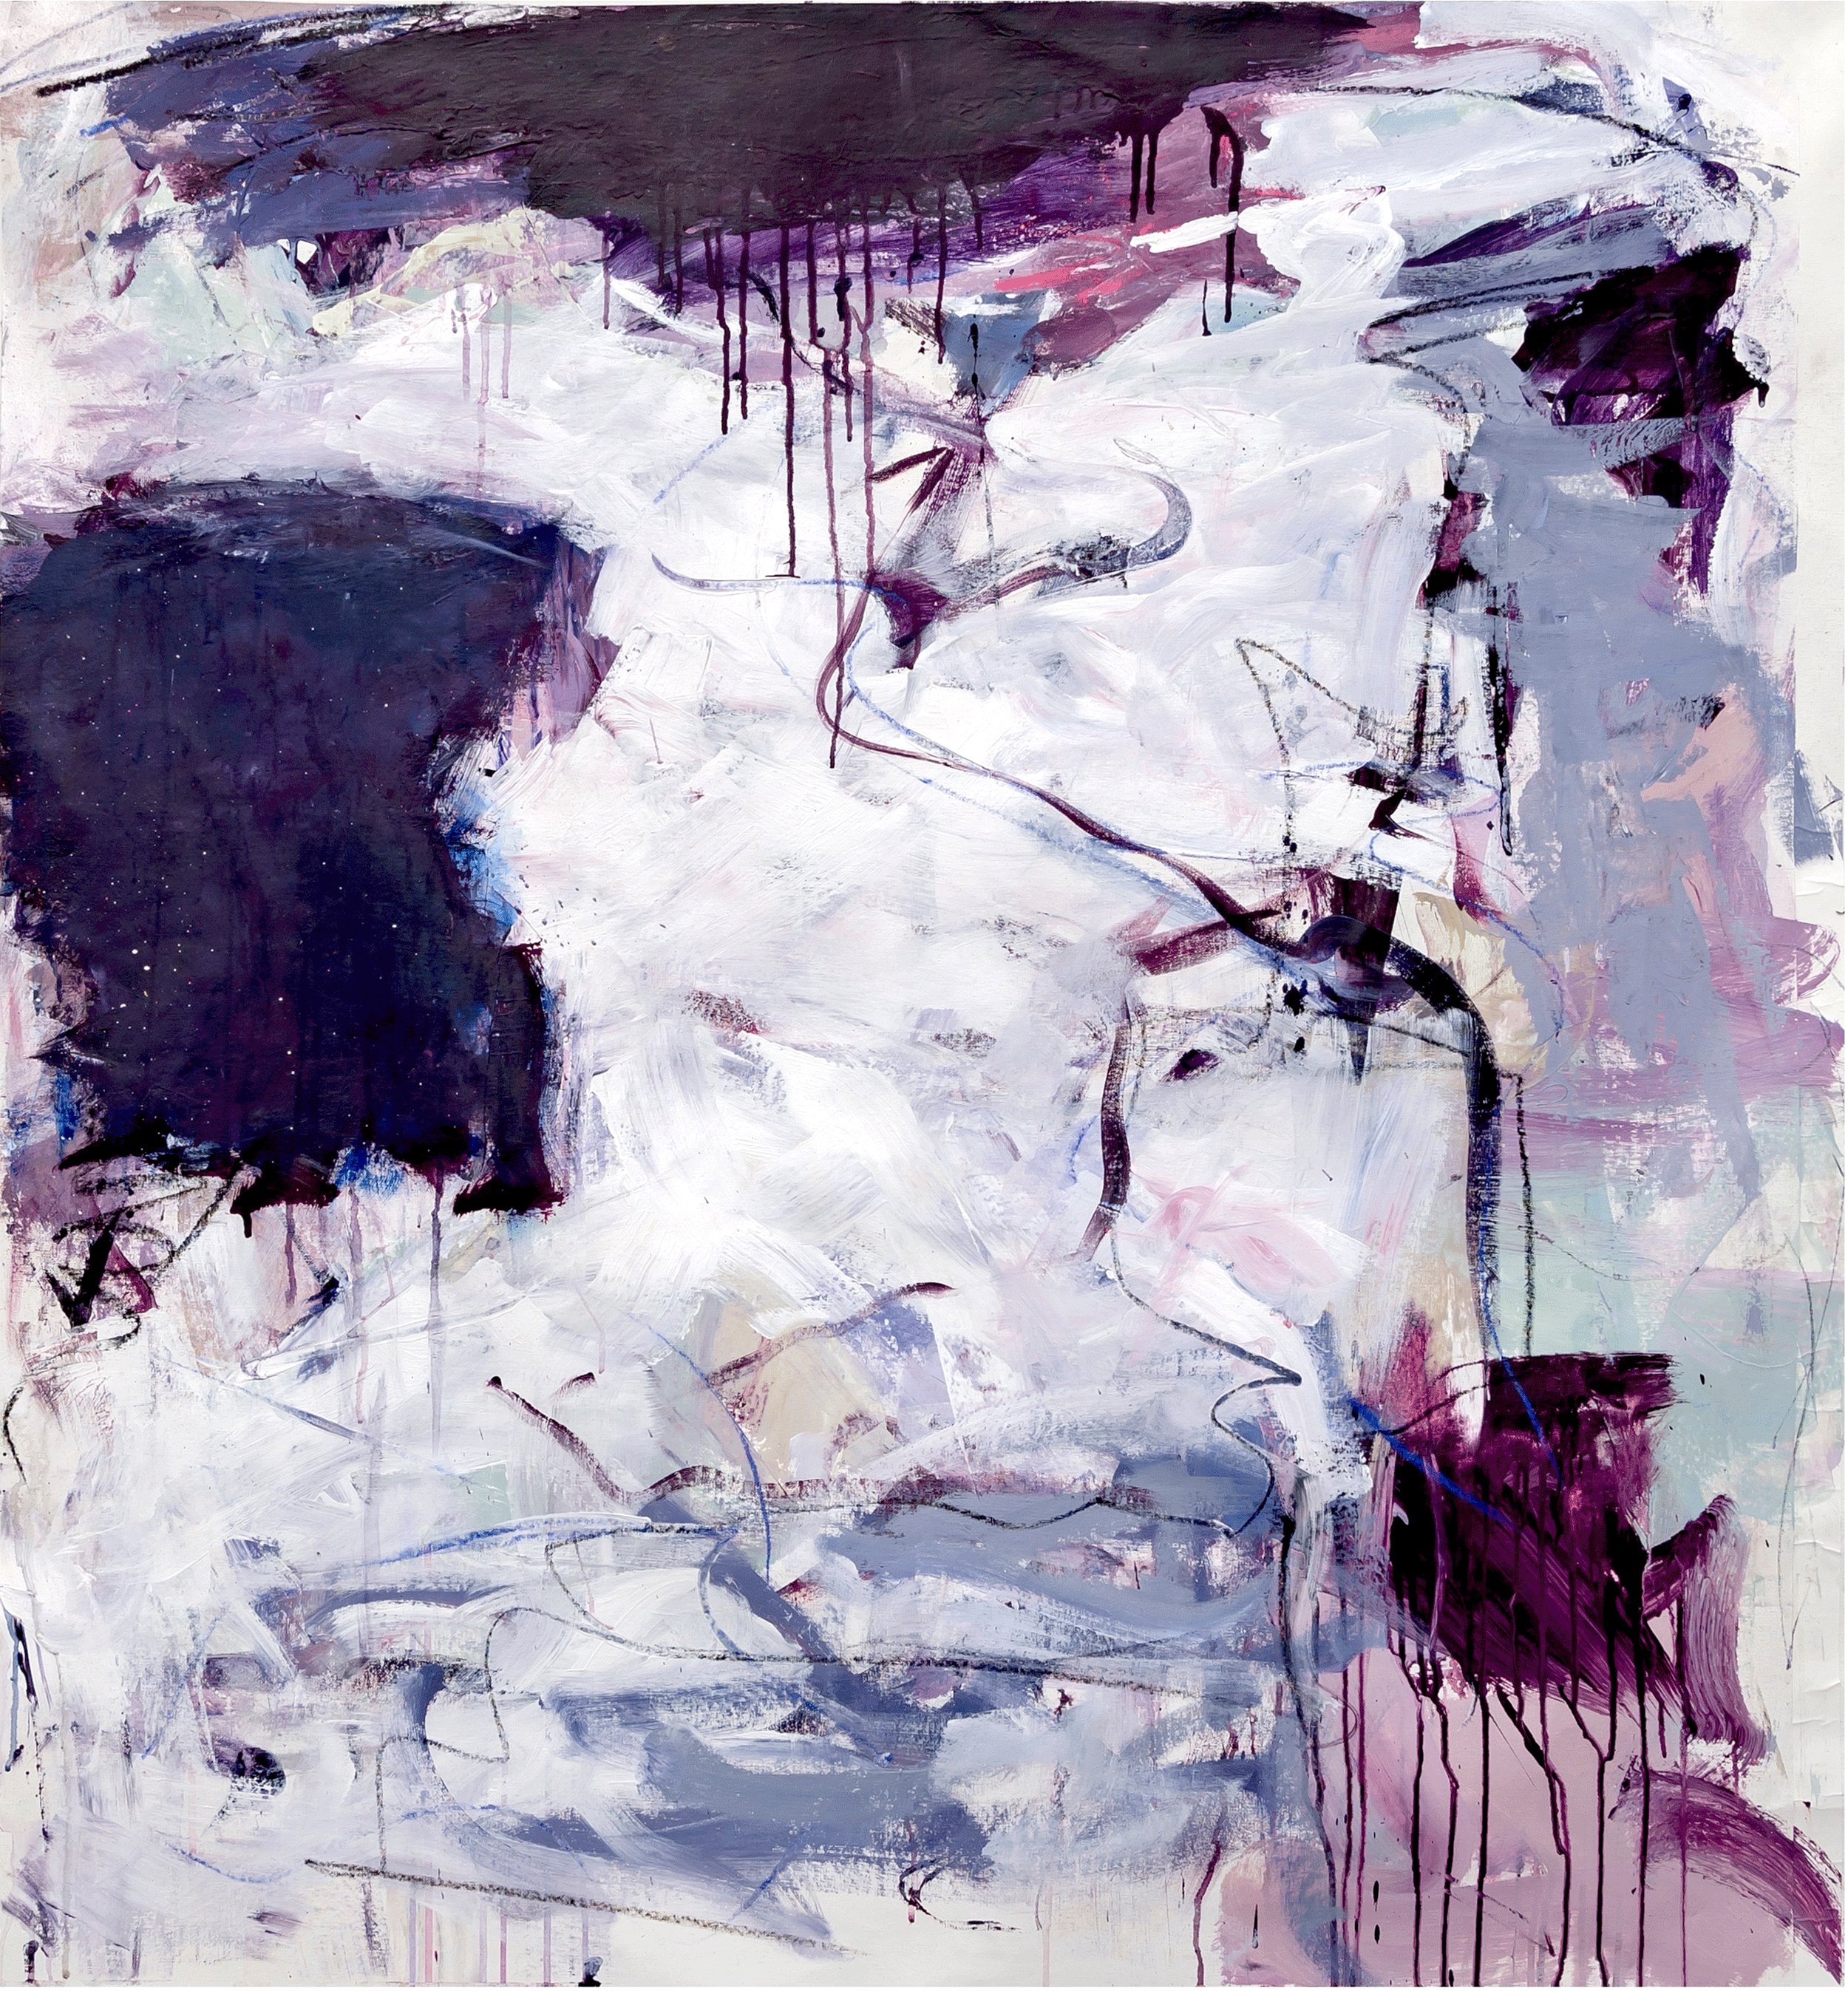 susan-levin-art-untitled-3.png